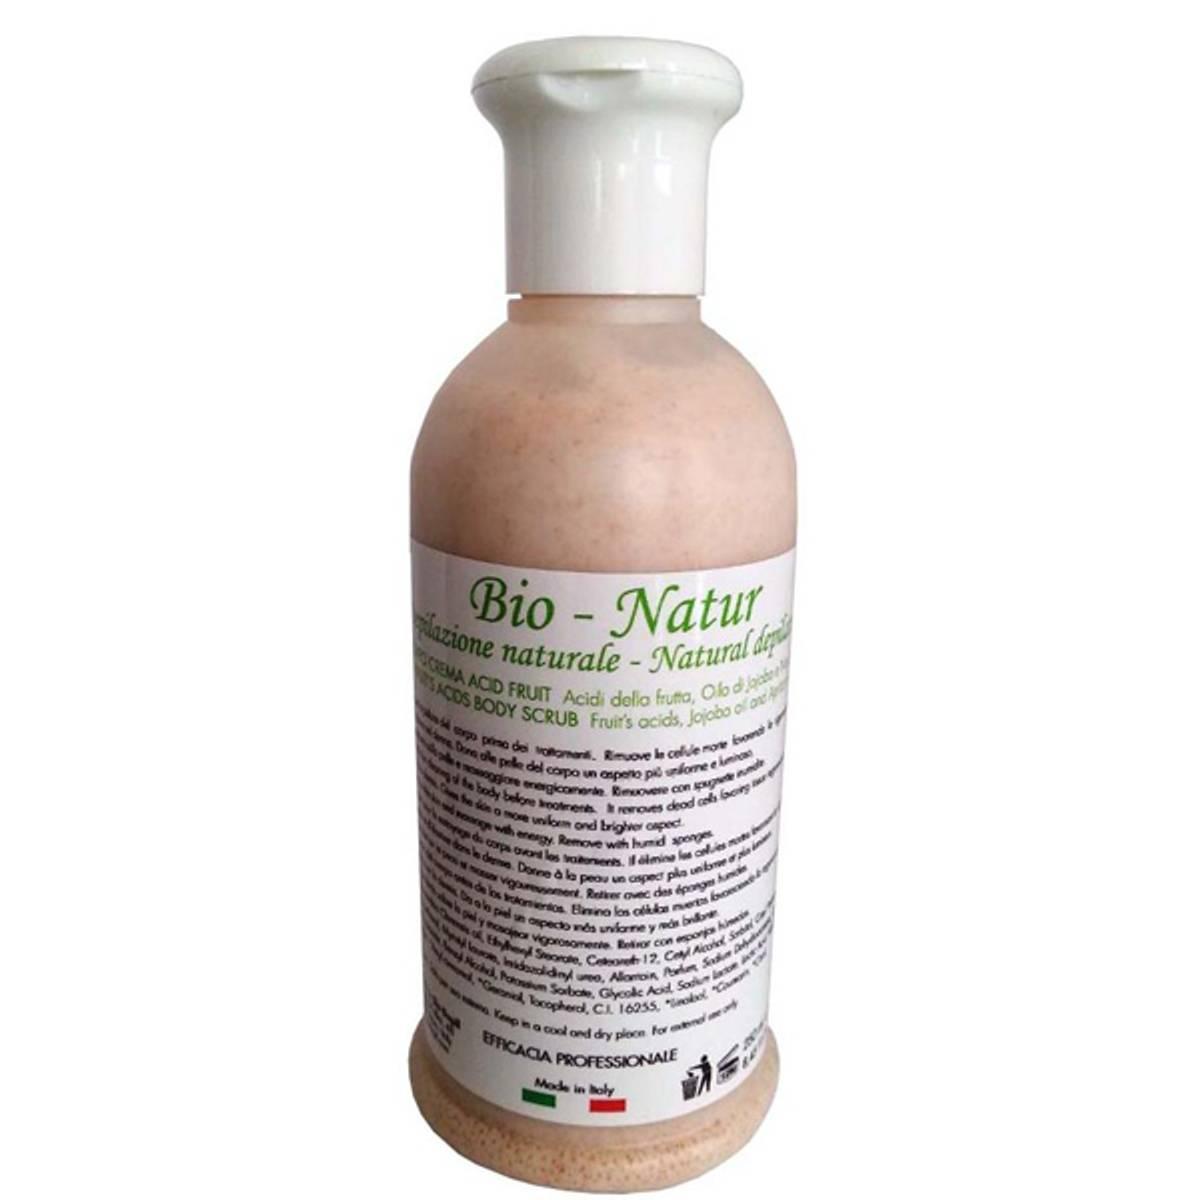 Bio-Natur Peeling (Fruits acid body scrub) 250 ml.